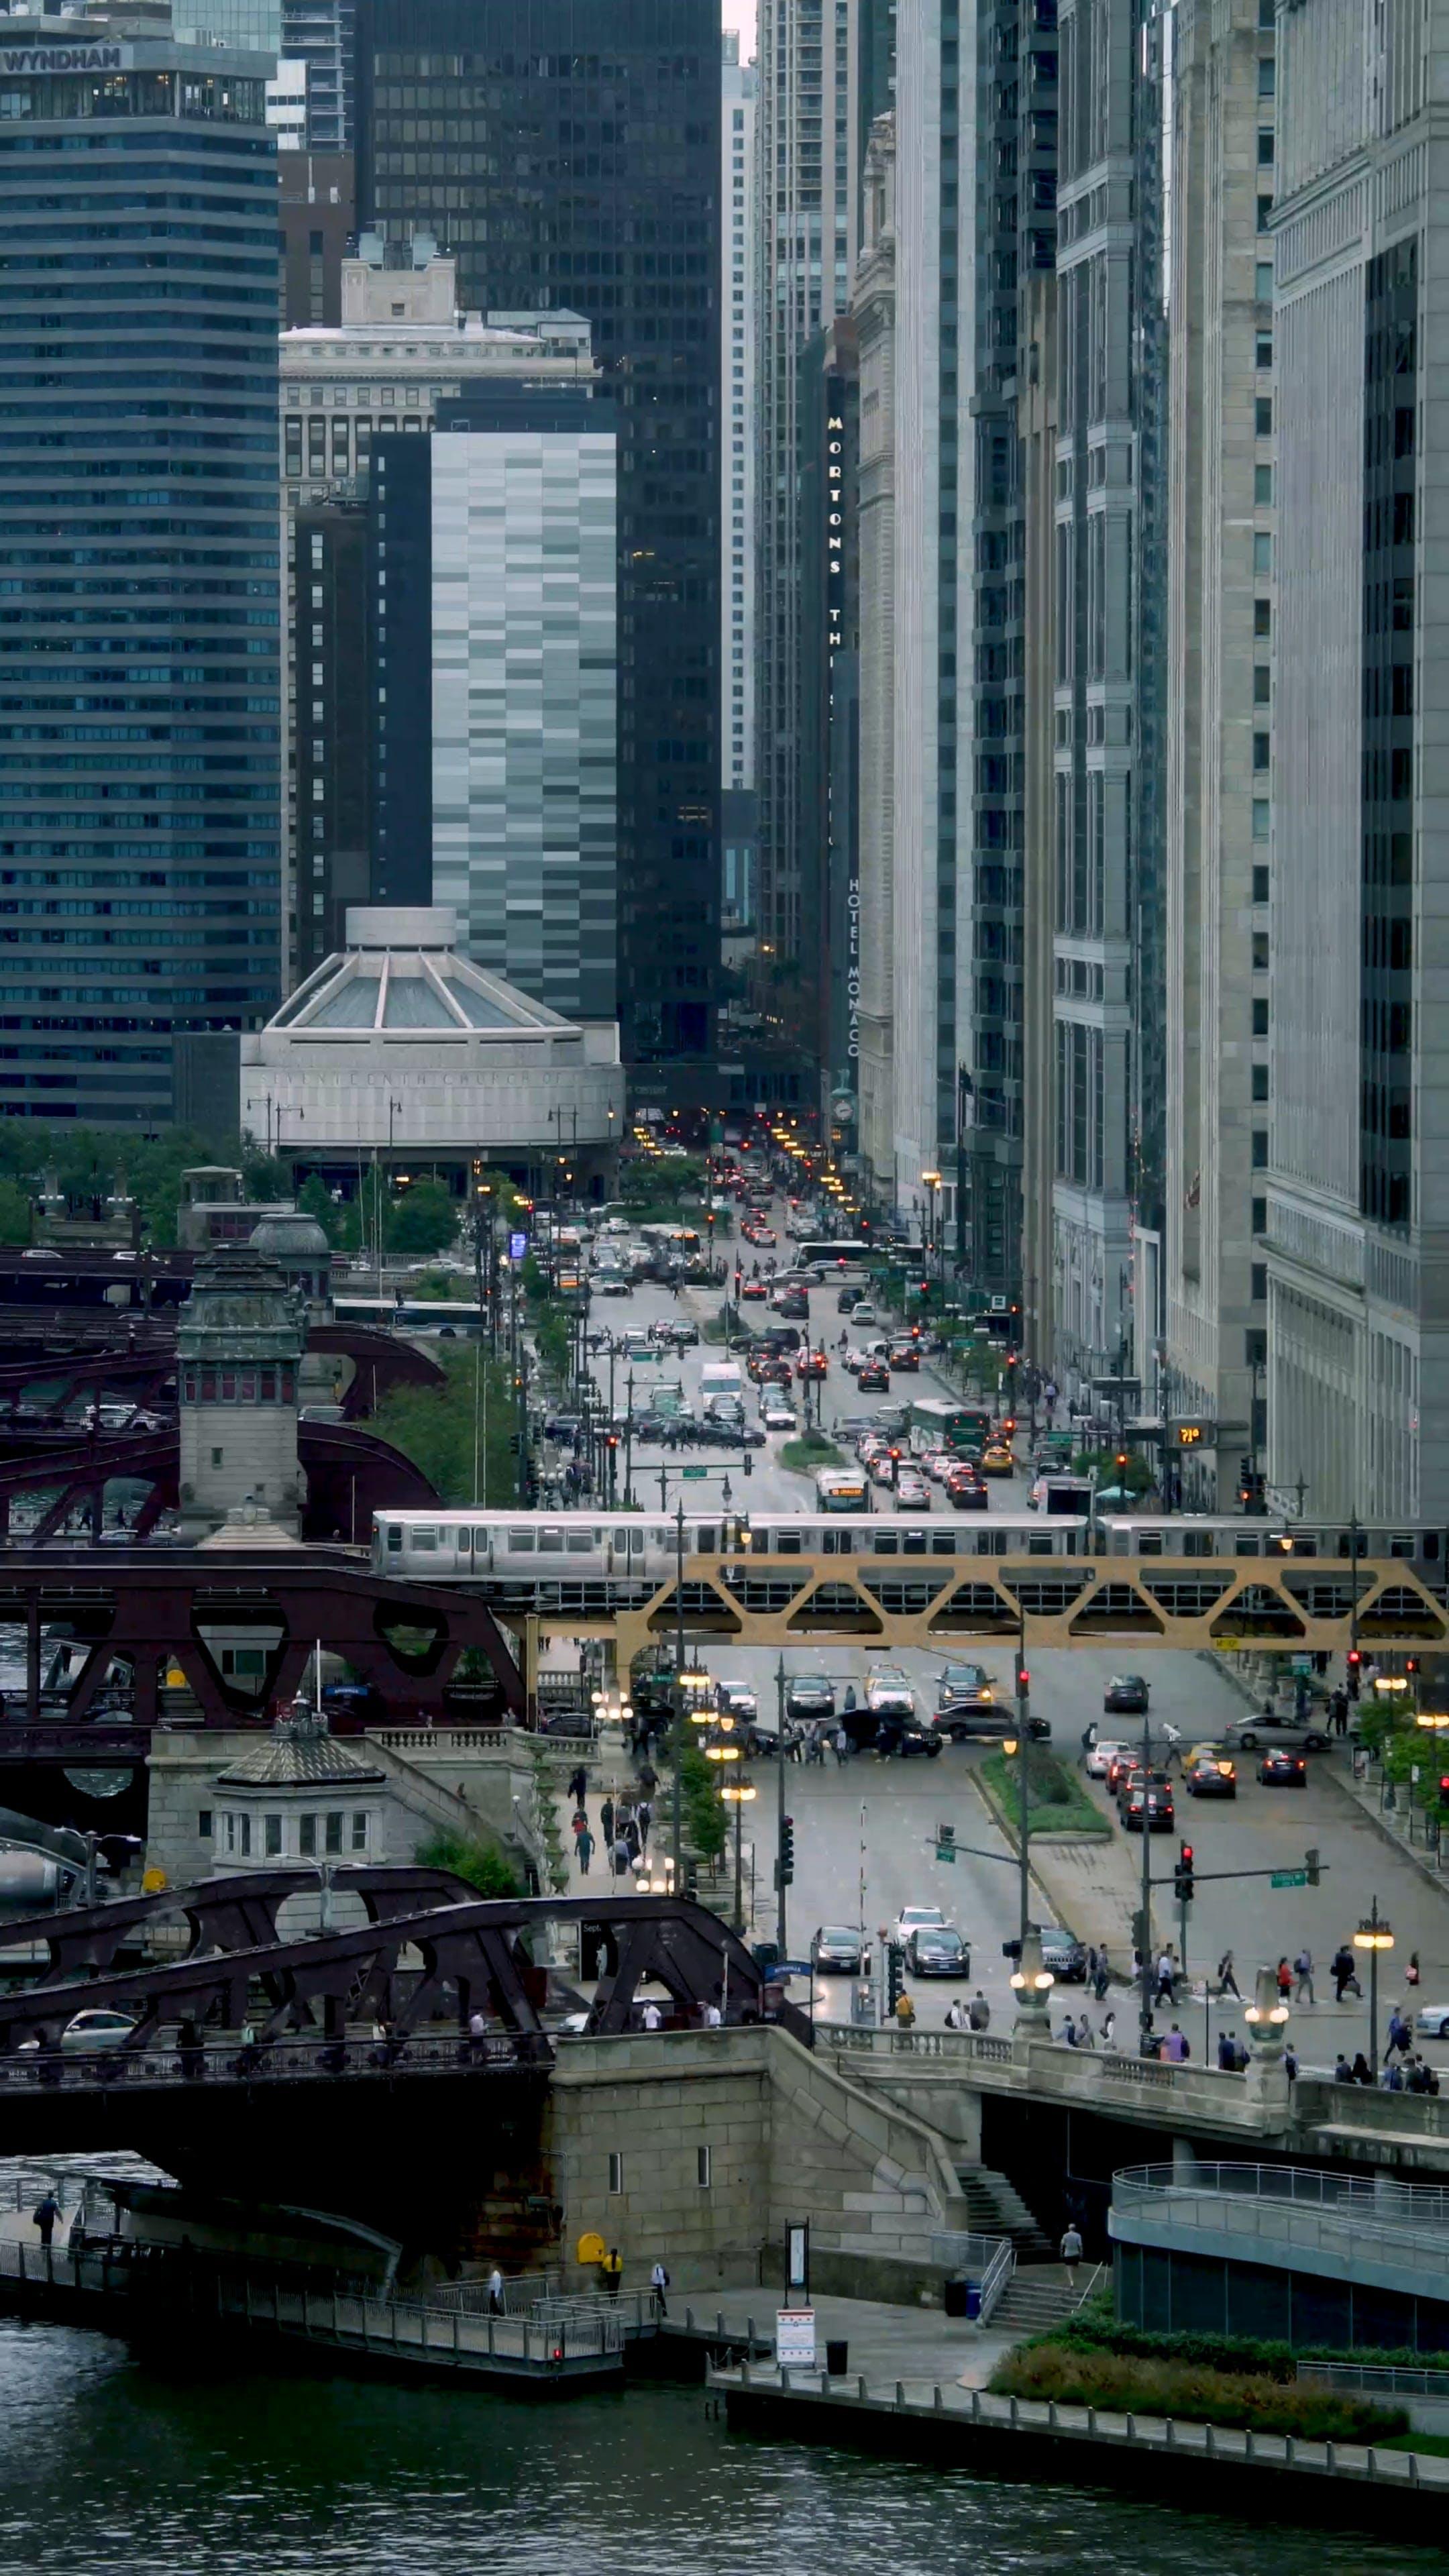 A Busy City Center